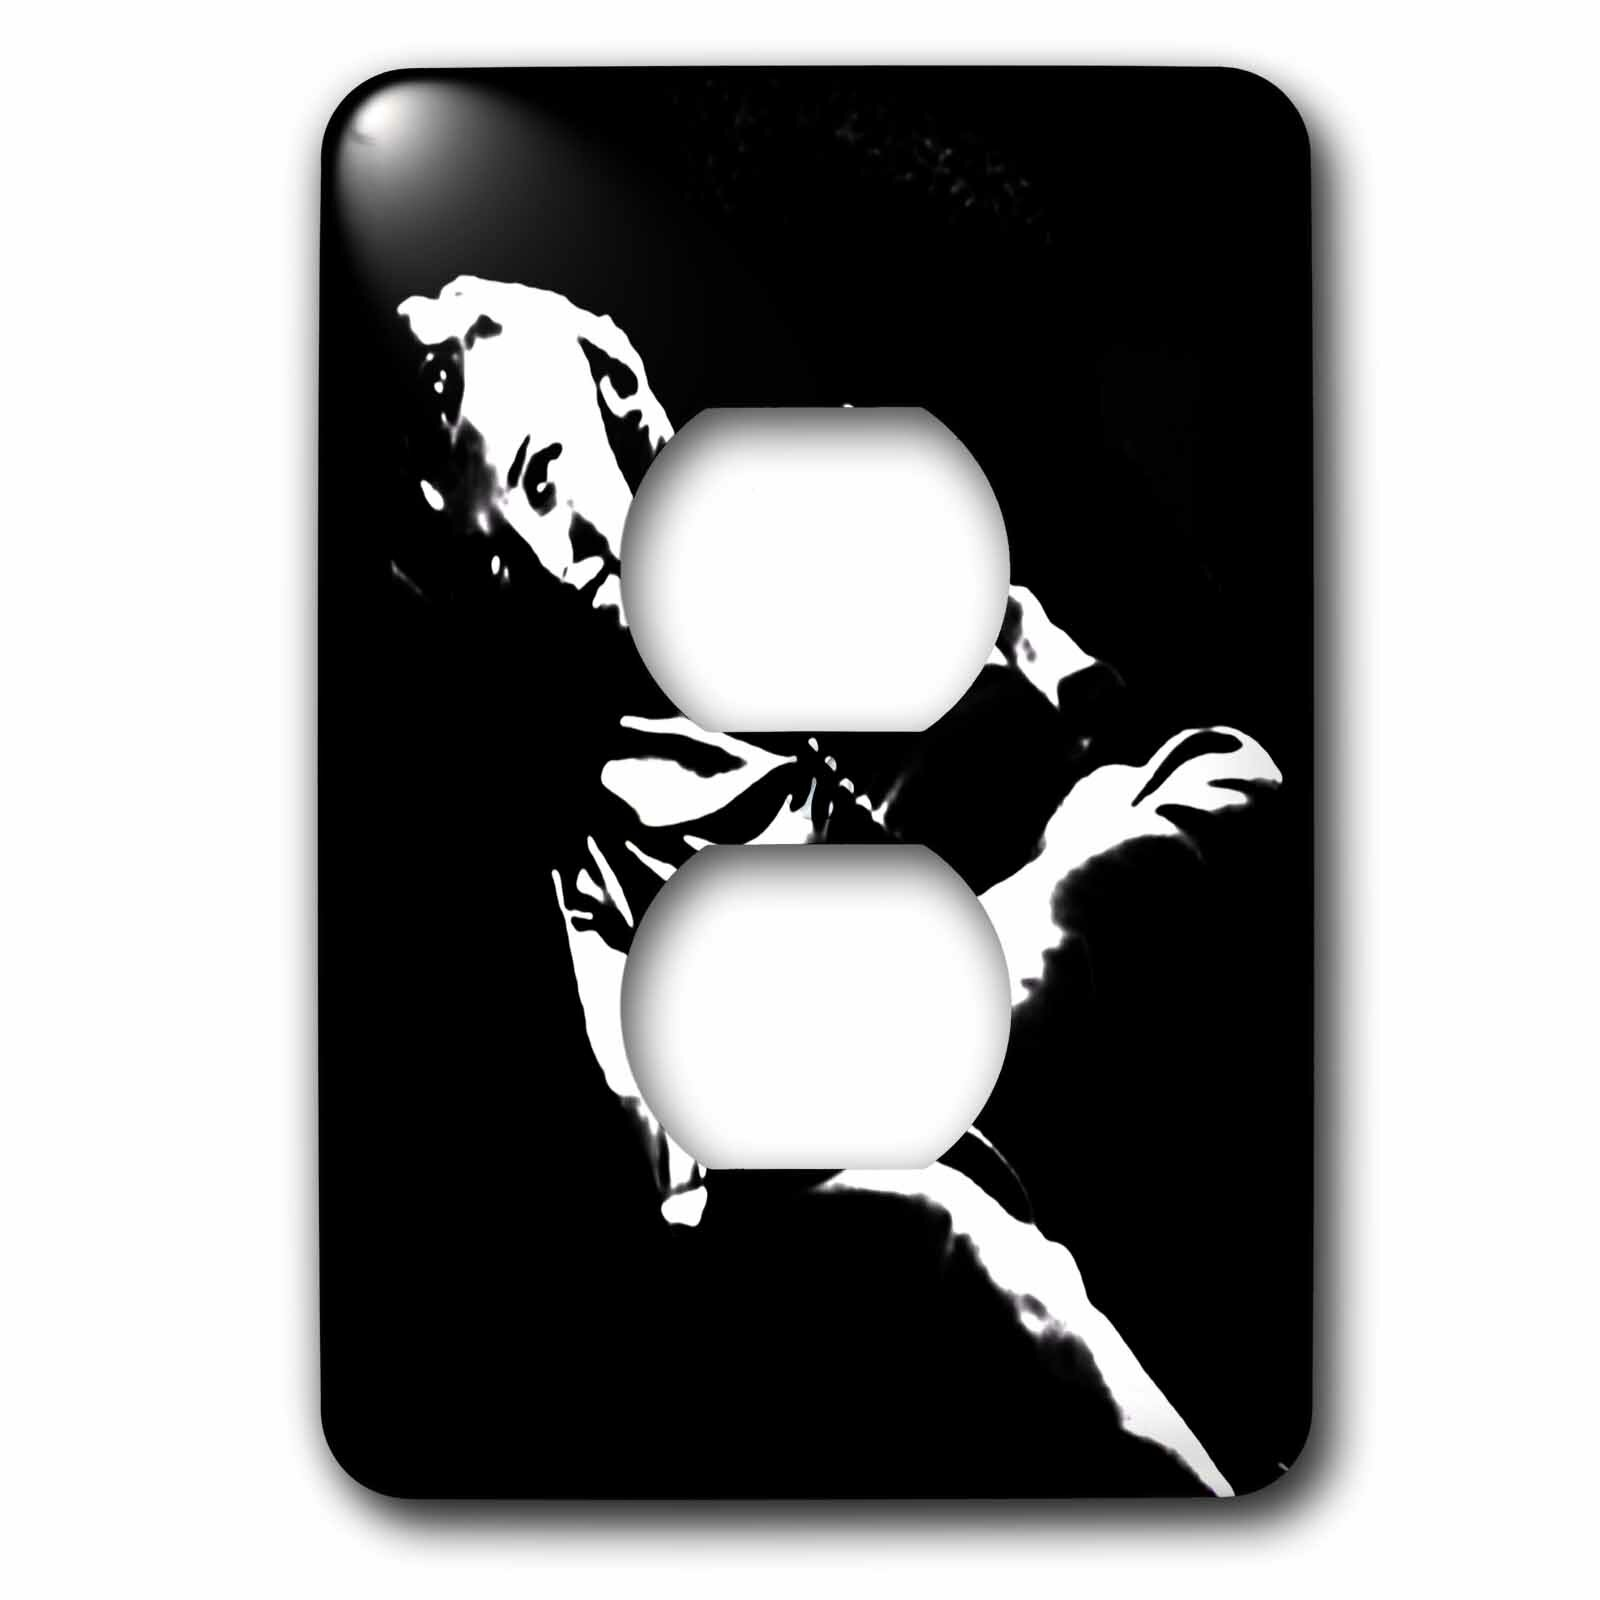 3drose Marilyn Monroe Marilyn Monroe Woman Silhouette Portrait Black And White Actress 1 Gang Duplex Outlet Wall Plate Wayfair